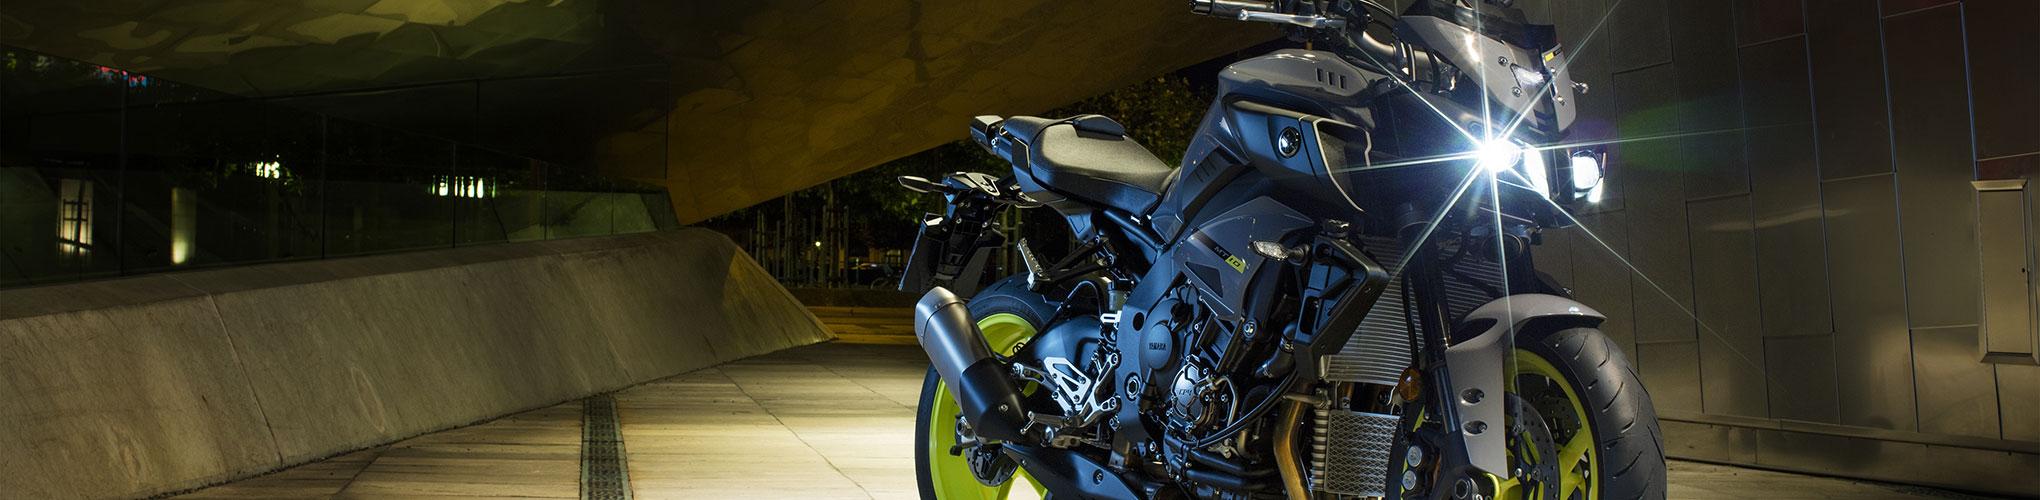 Yamaha MT-10 ABS | MotorCentrumWest